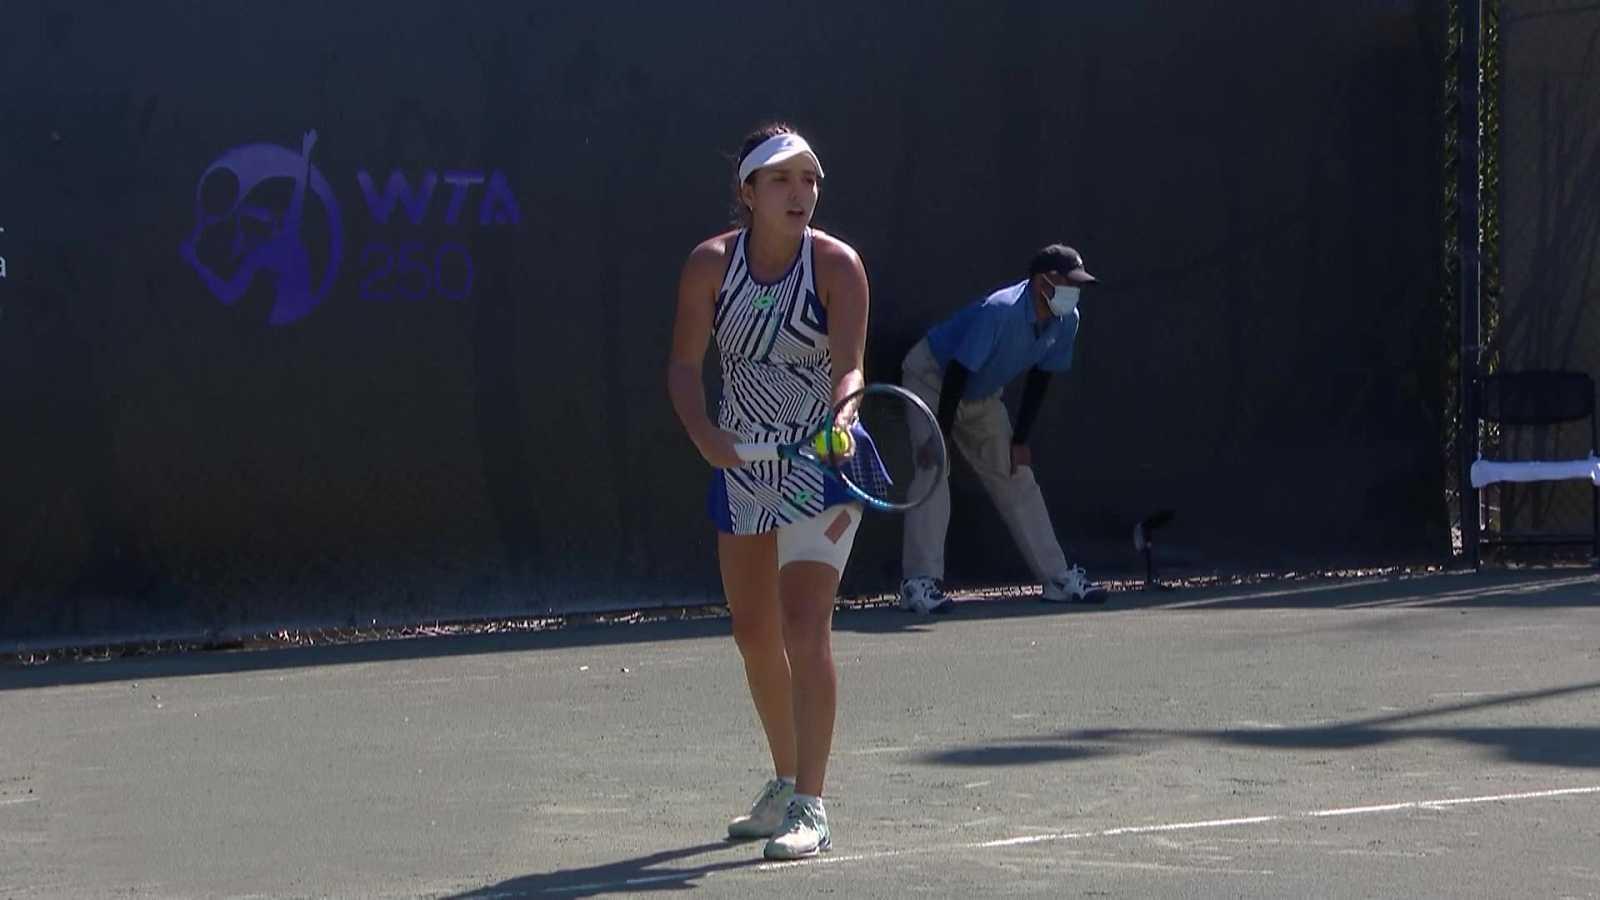 Tenis - WTA 250 Torneo Charleston. 2ª Semifinal: A. Sharma - M. Osorio Serrano - ver ahora